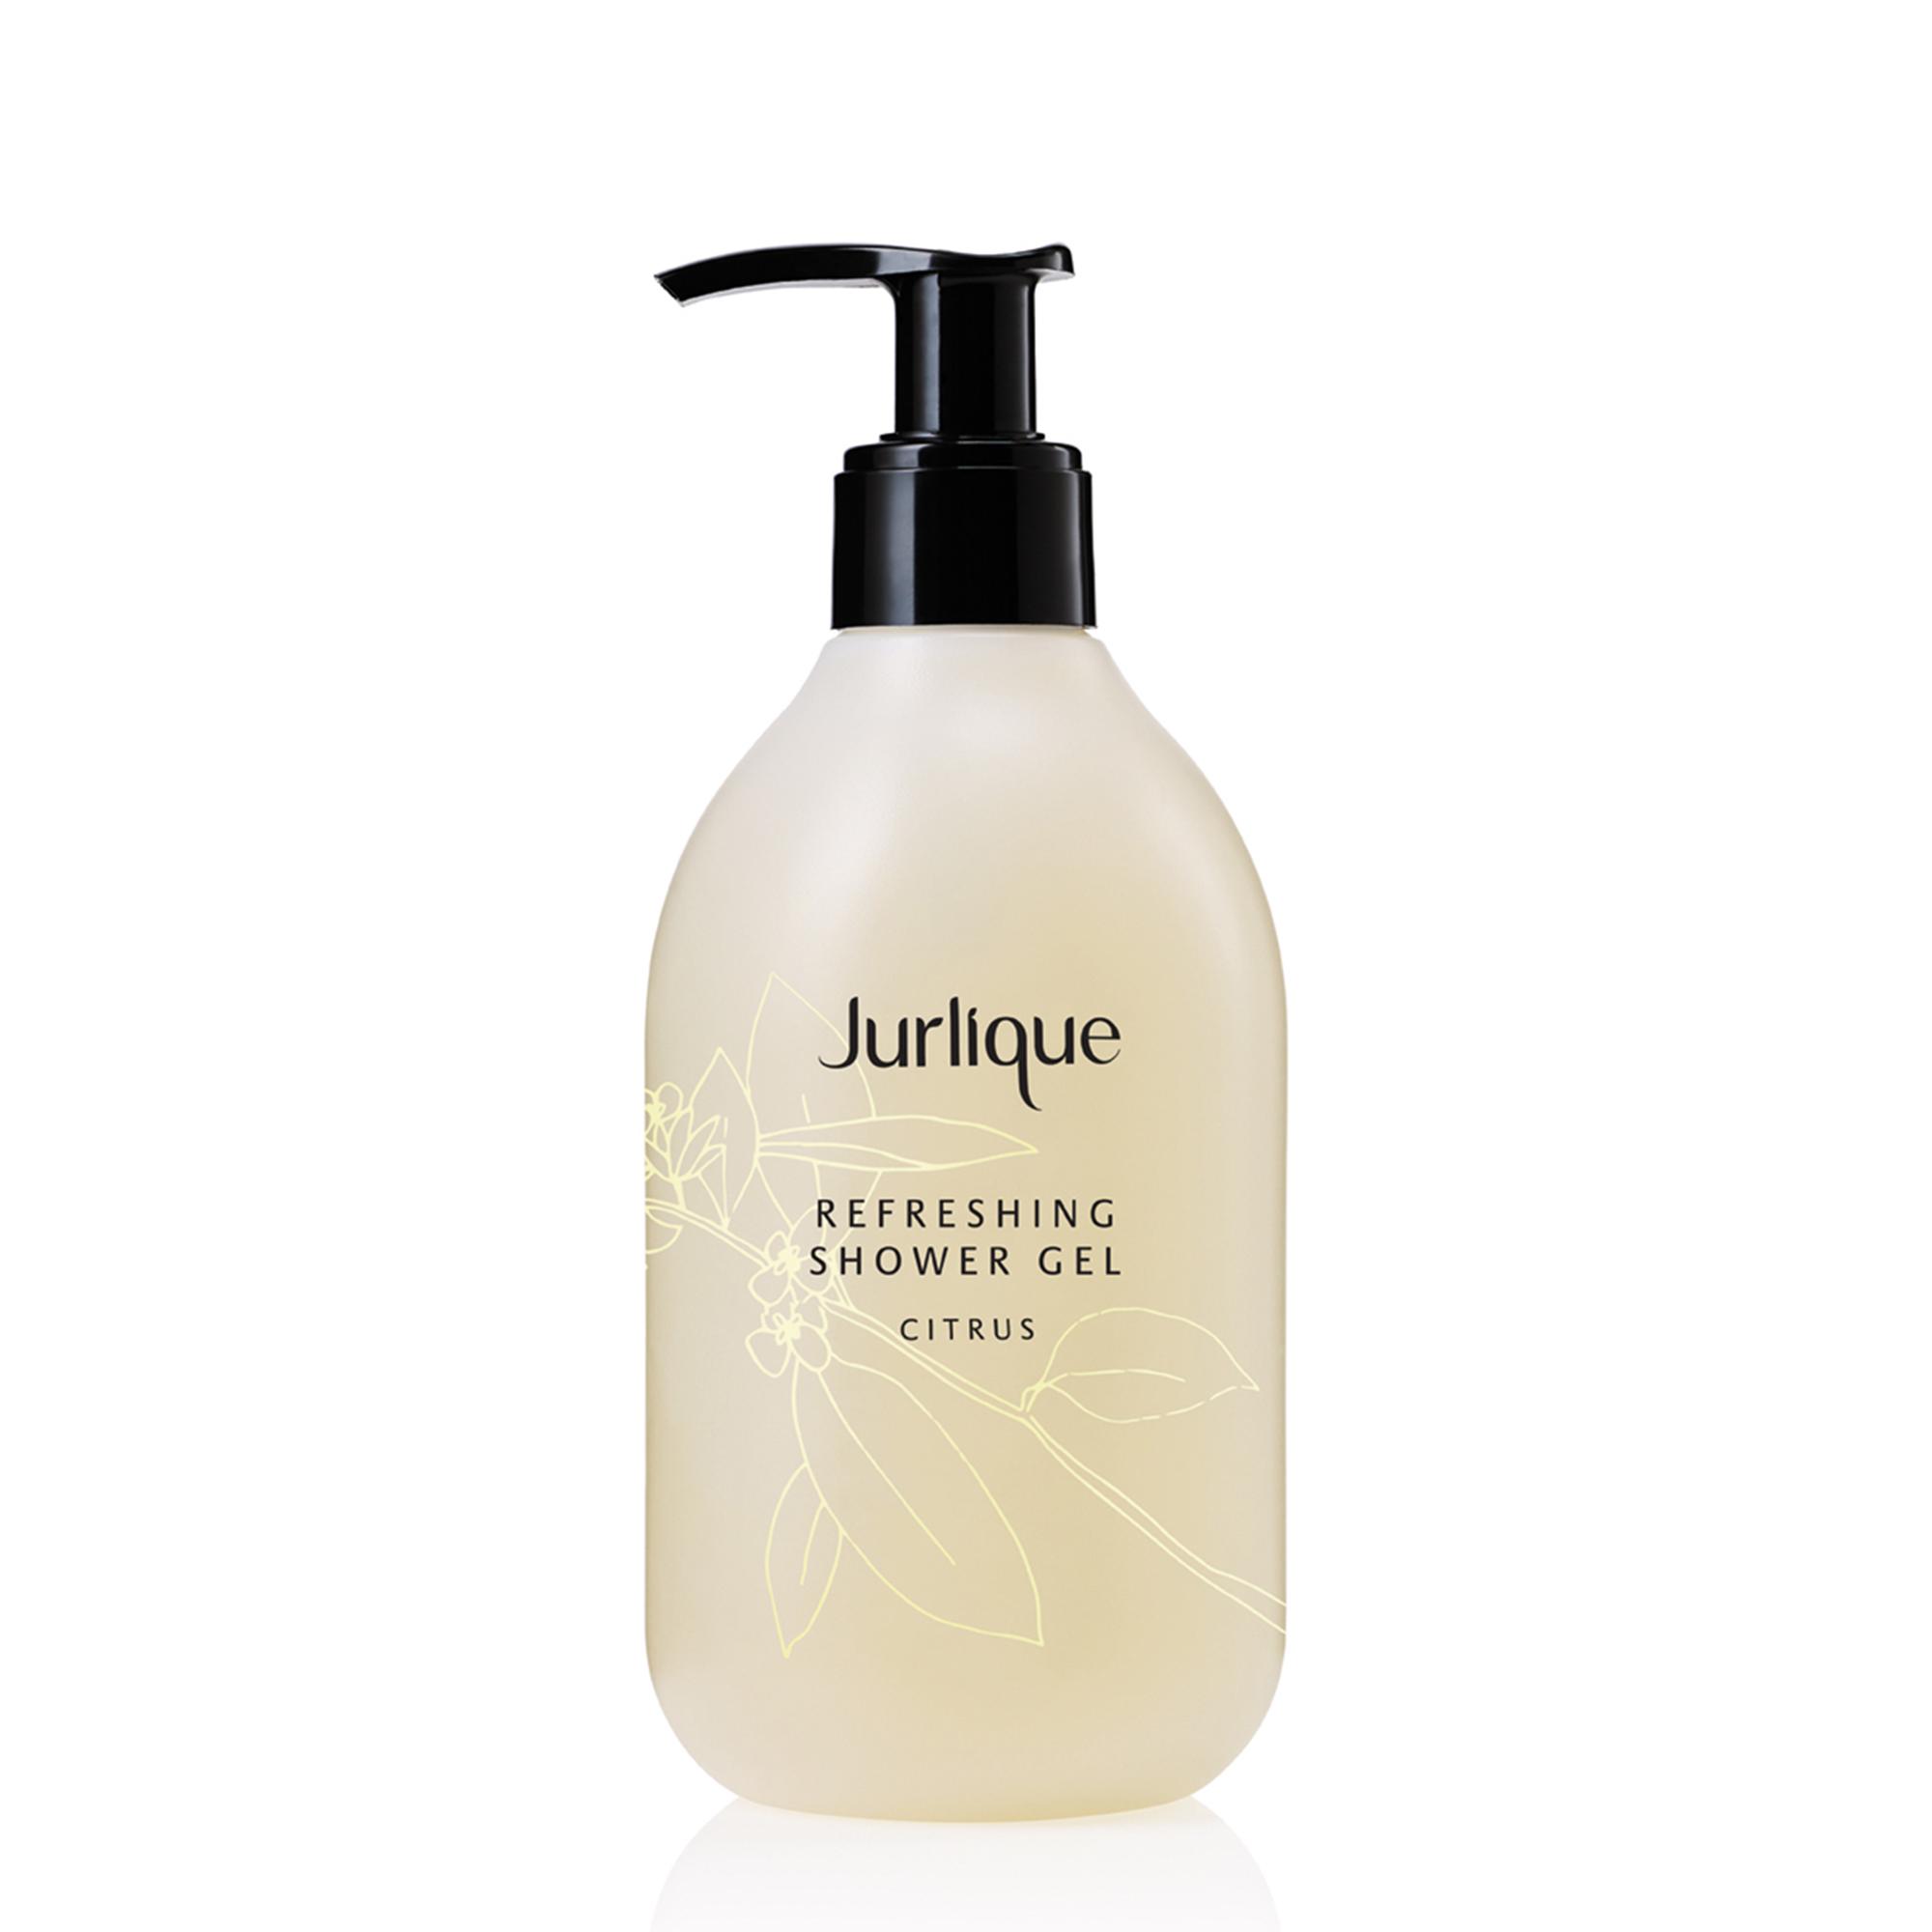 Jurlique Refreshing Citrus Shower Gel, 300 ml